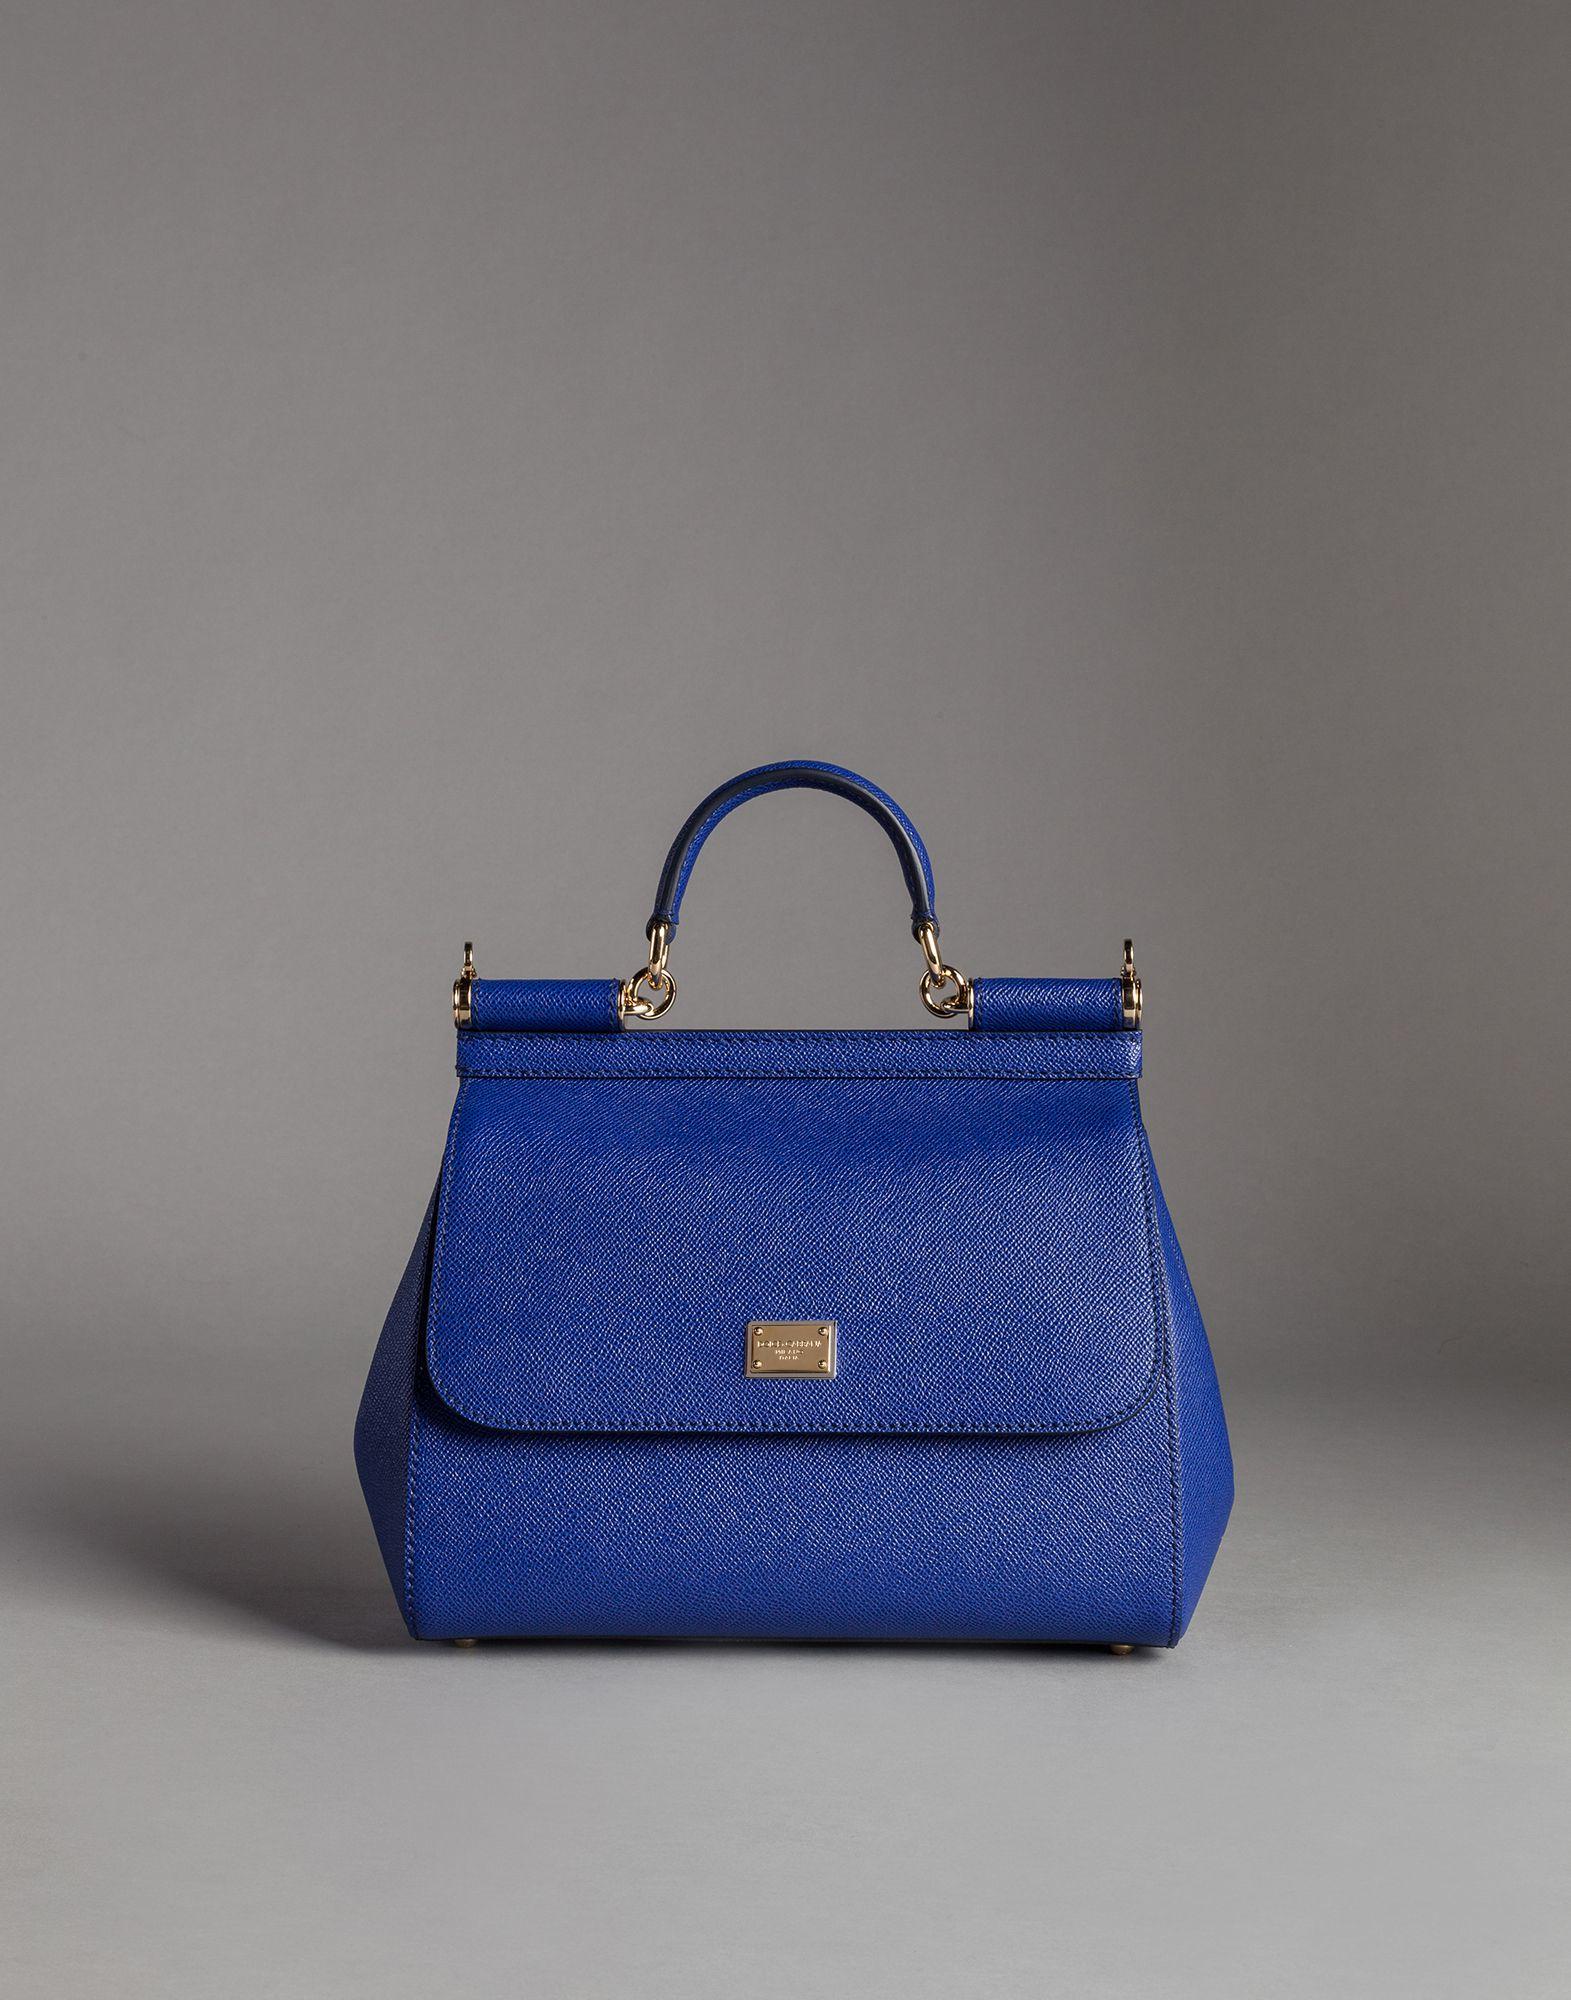 bec083fd87a Dolce & Gabbana Medium Dauphine Calfskin Sicily Bag in Blue - Lyst